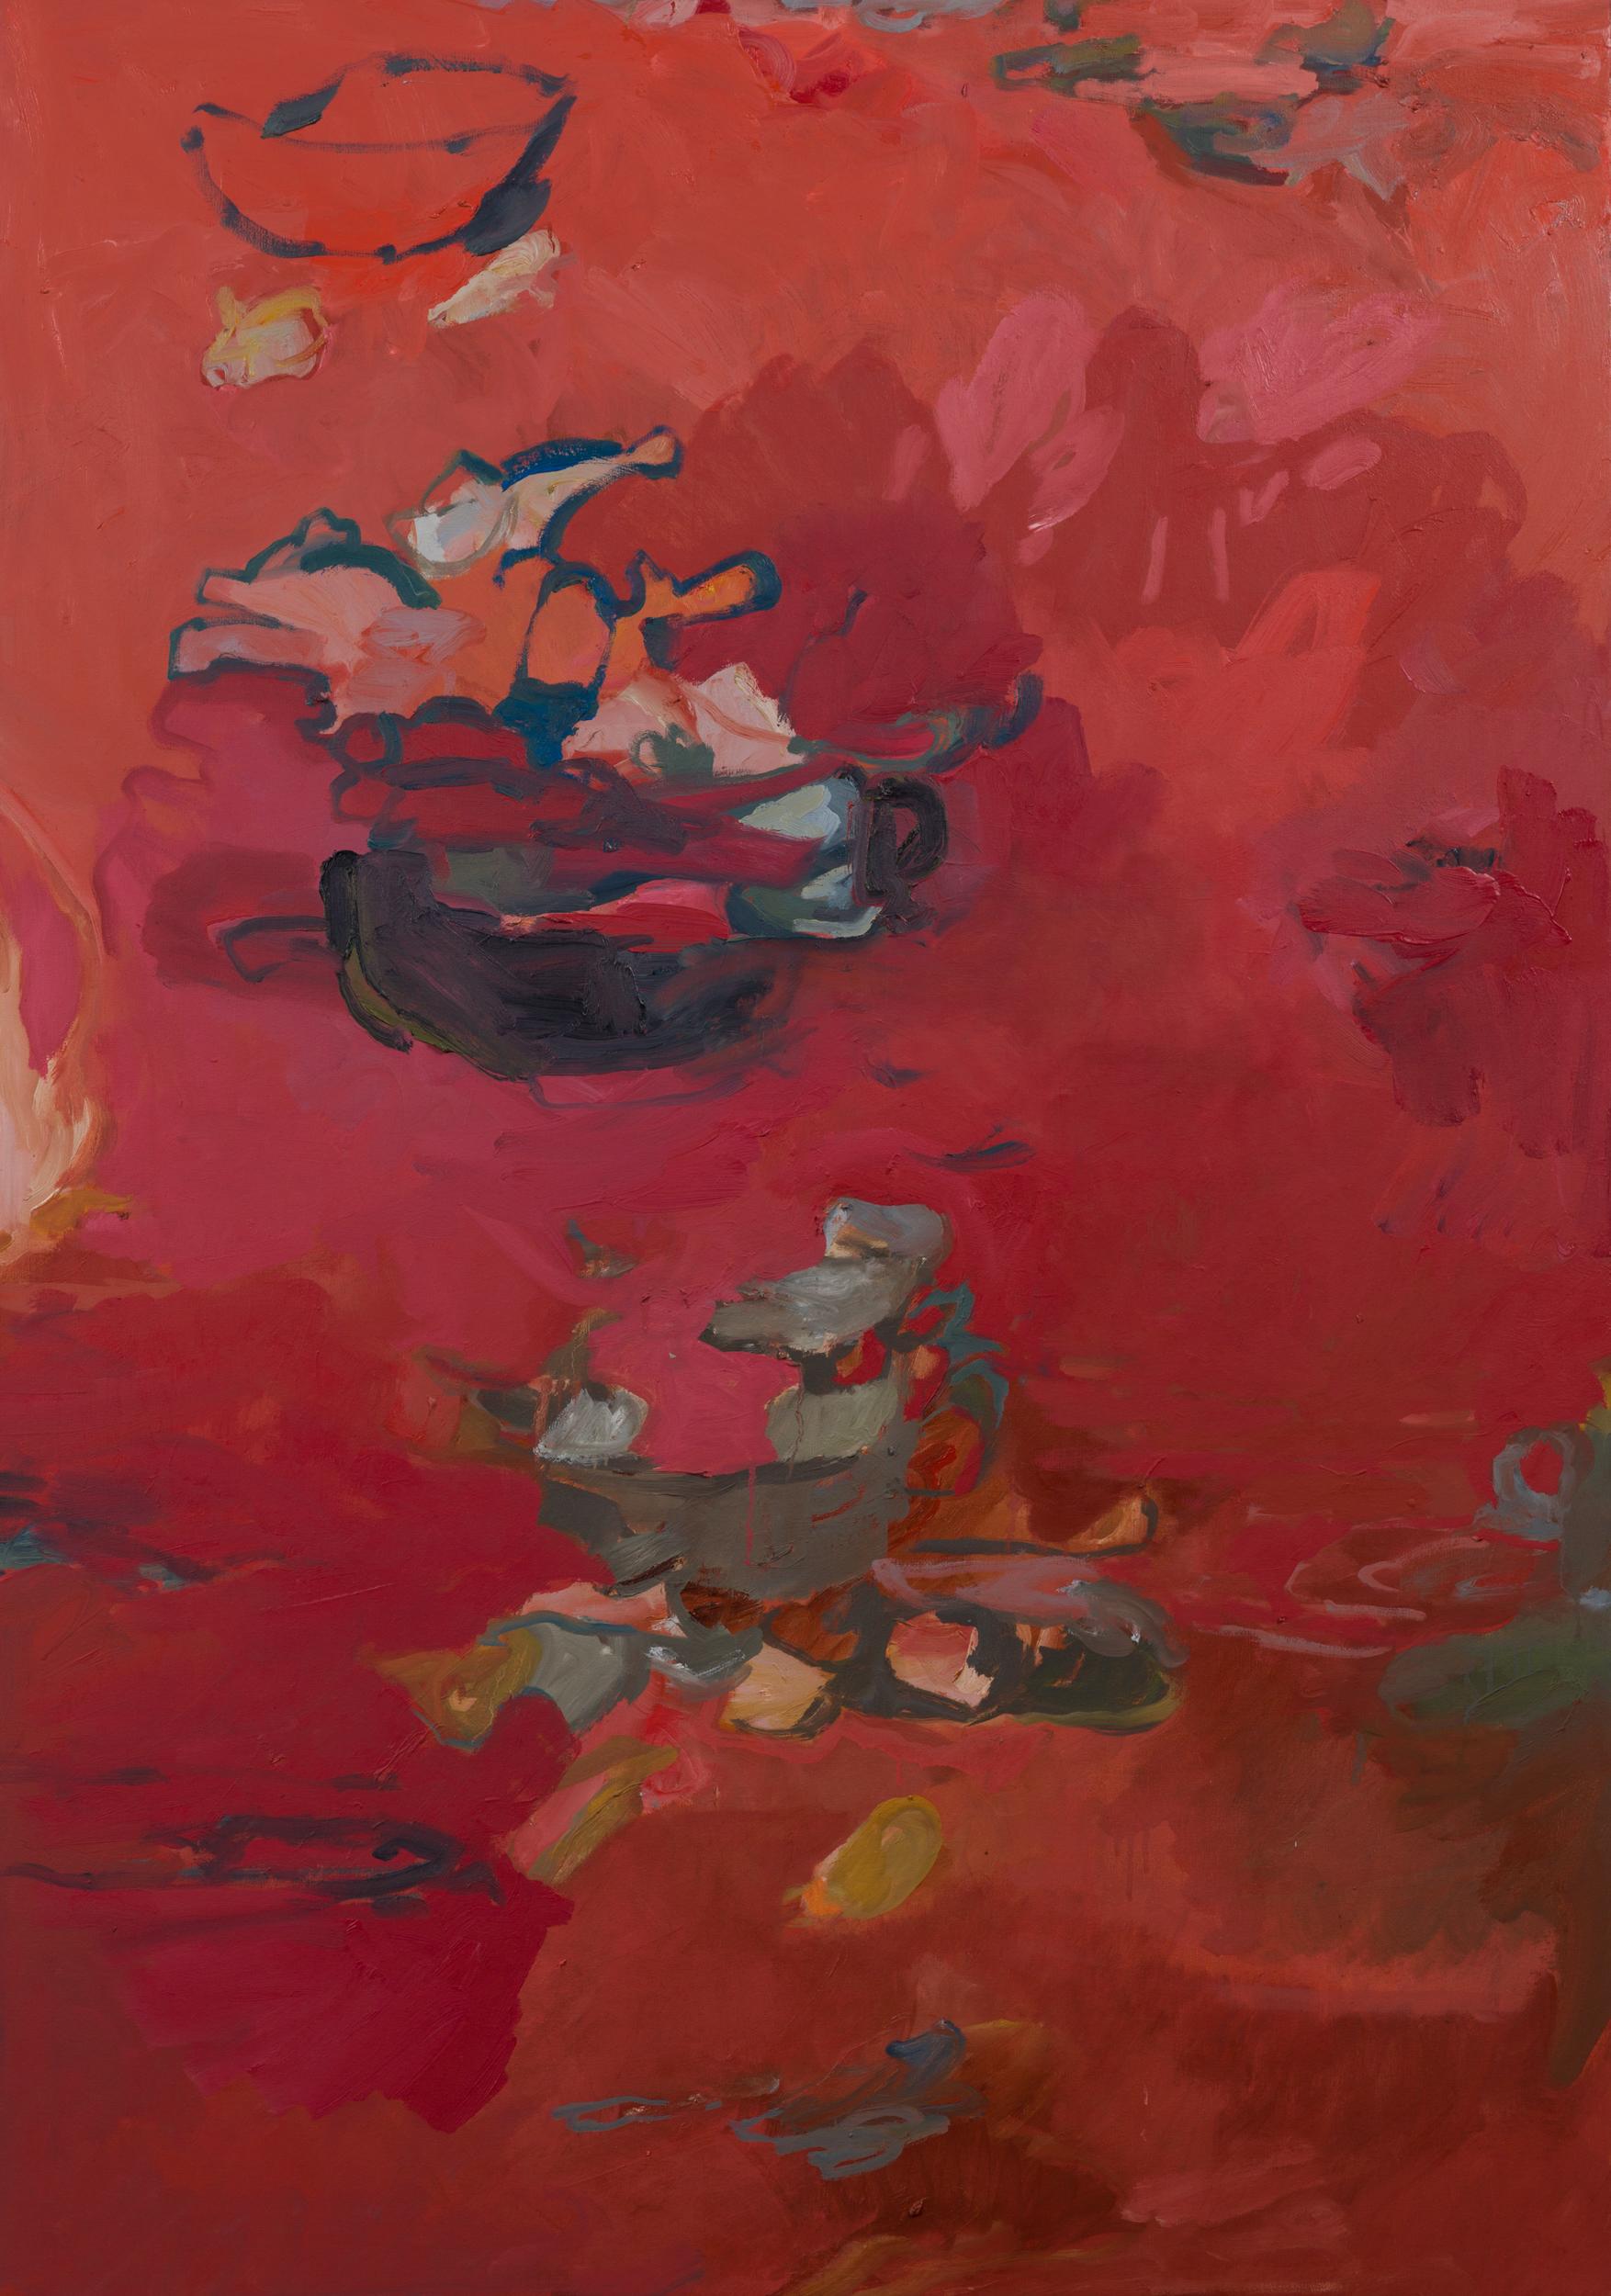 "Spirit Feast, 54 x 36"" Oil on Canvas 2019"